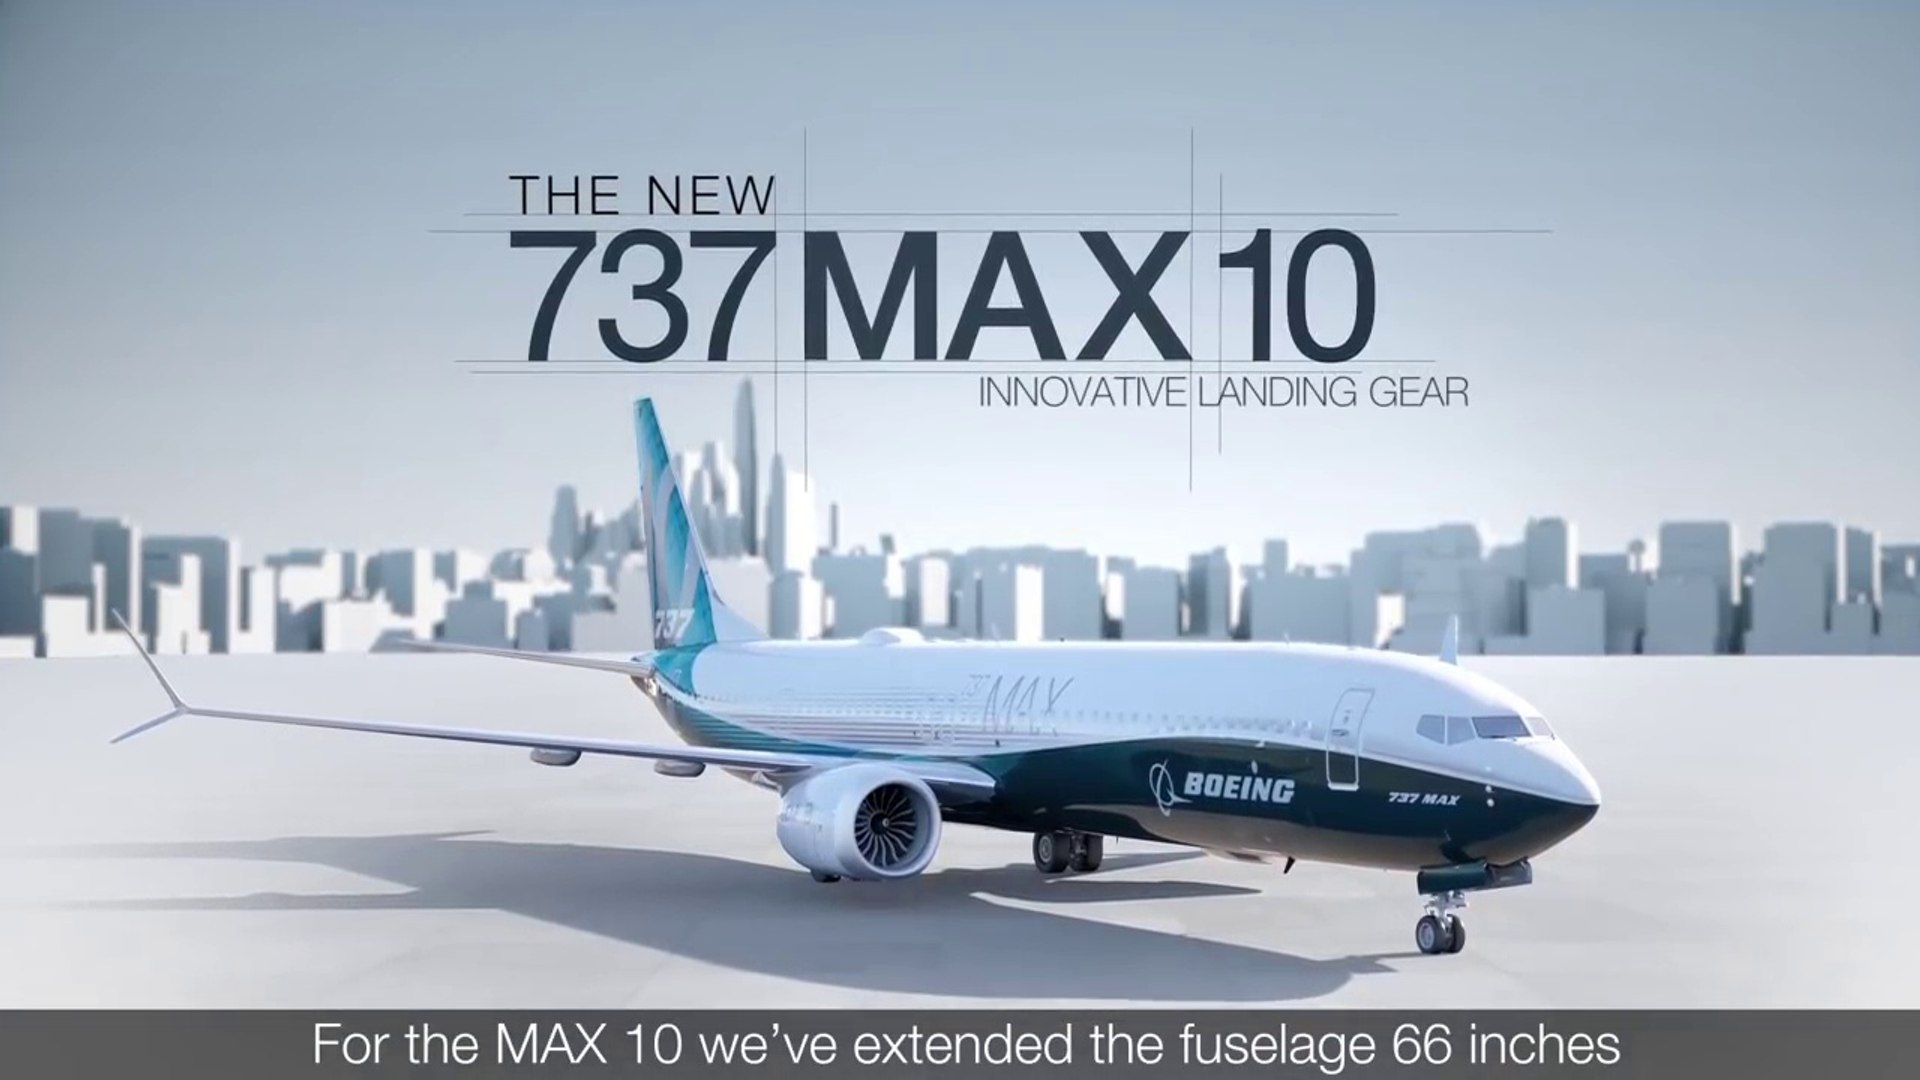 Boeing 737 MAX 10 Landing Gear